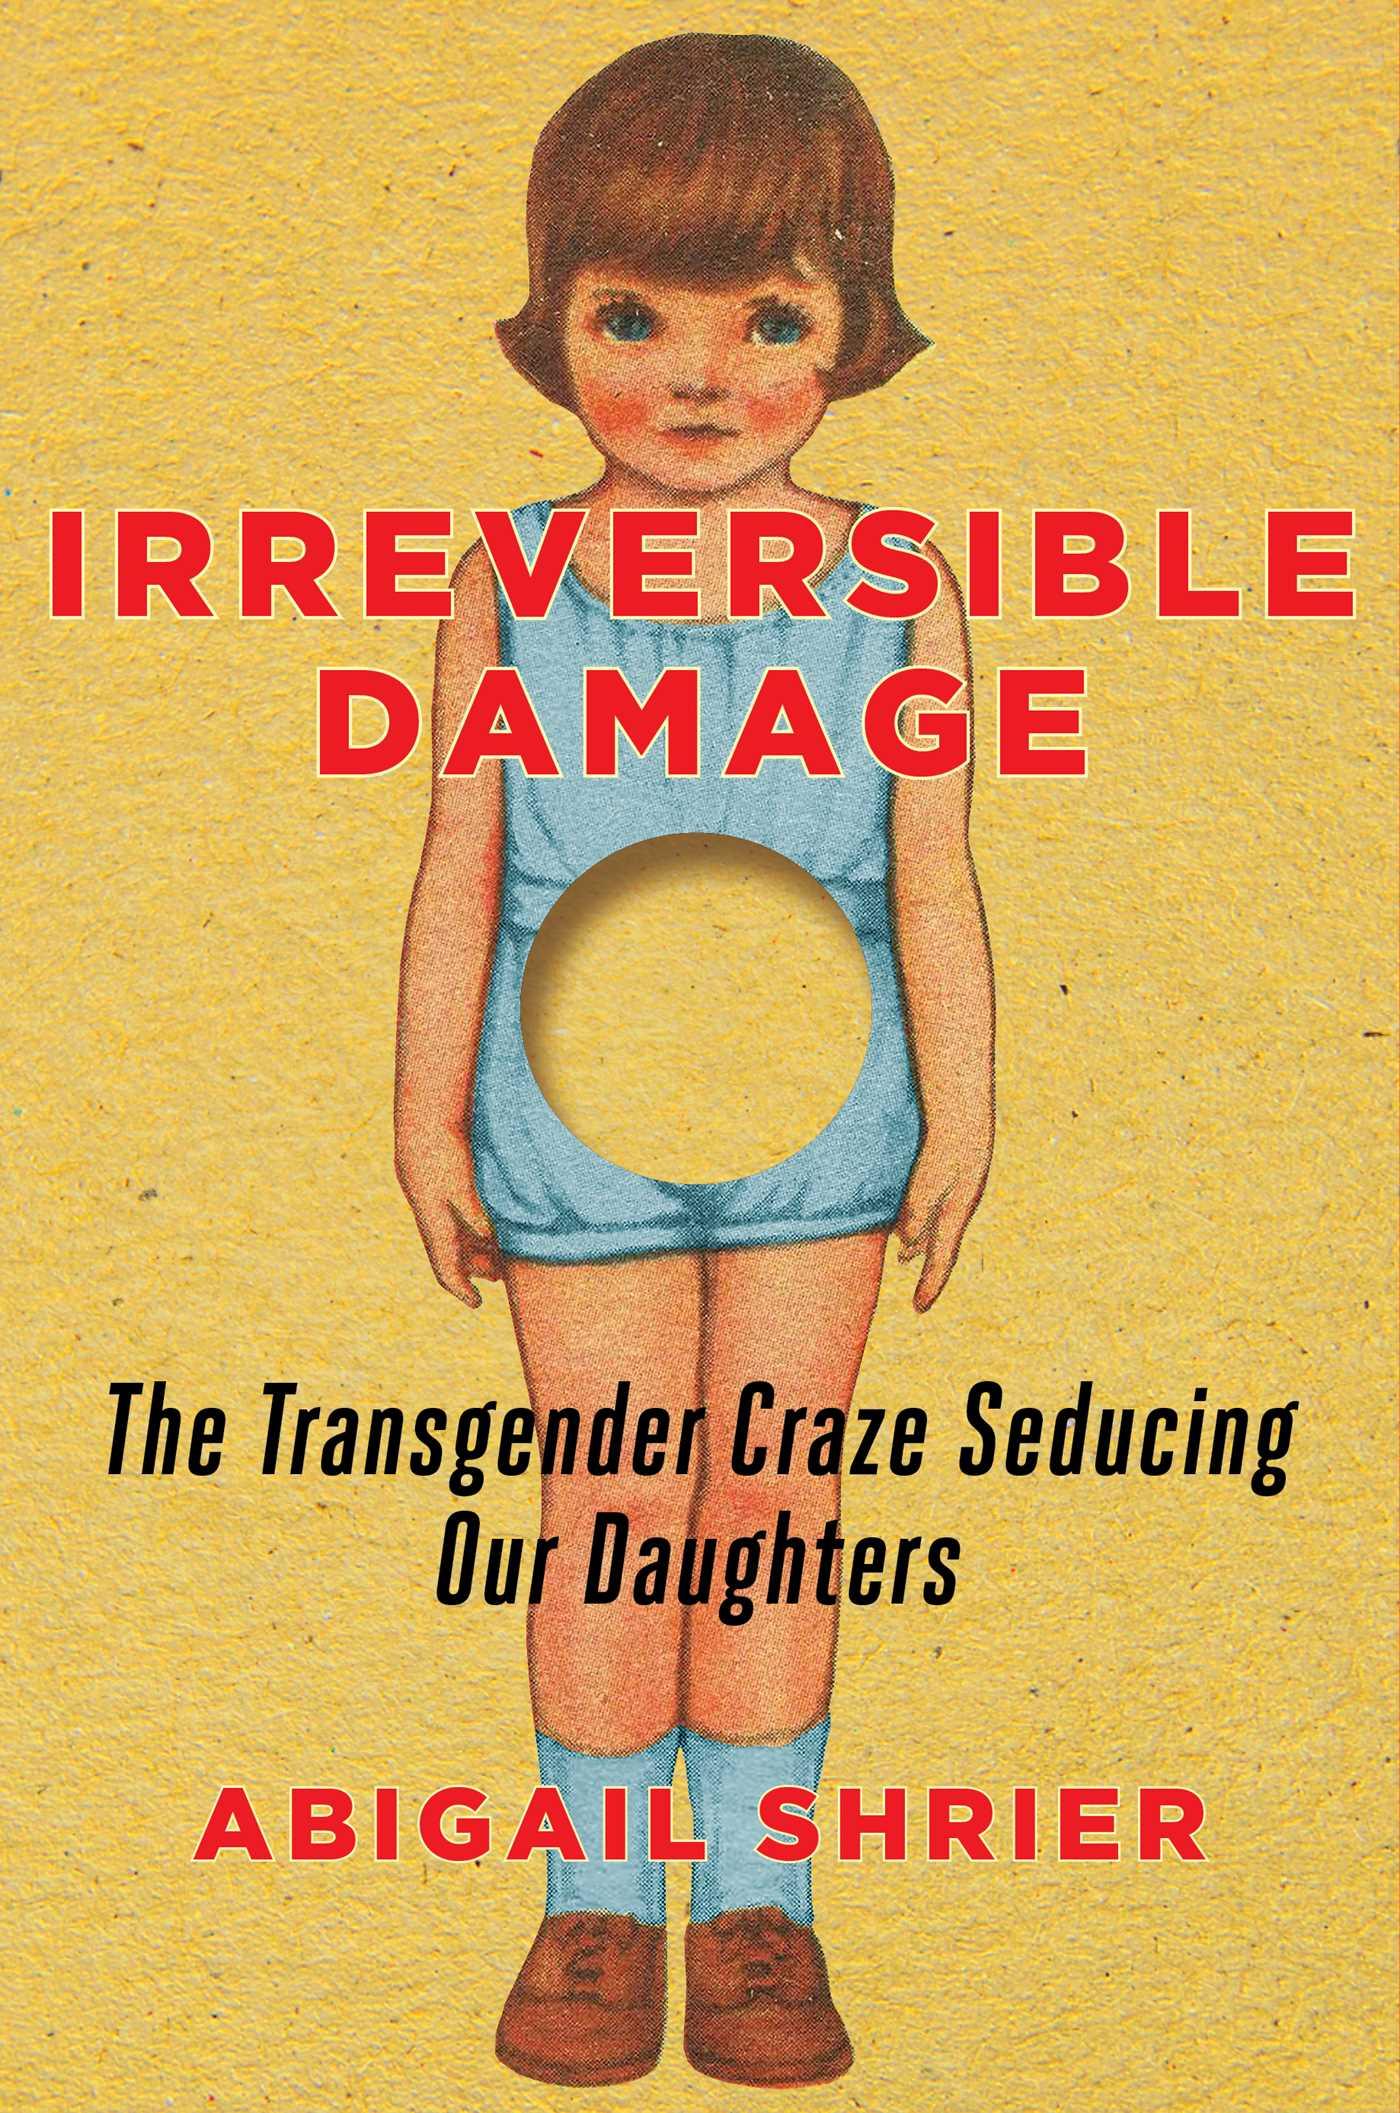 Abigail Shrier. Irreversible Damage: The Transgender Craze Seducing Our Daughters